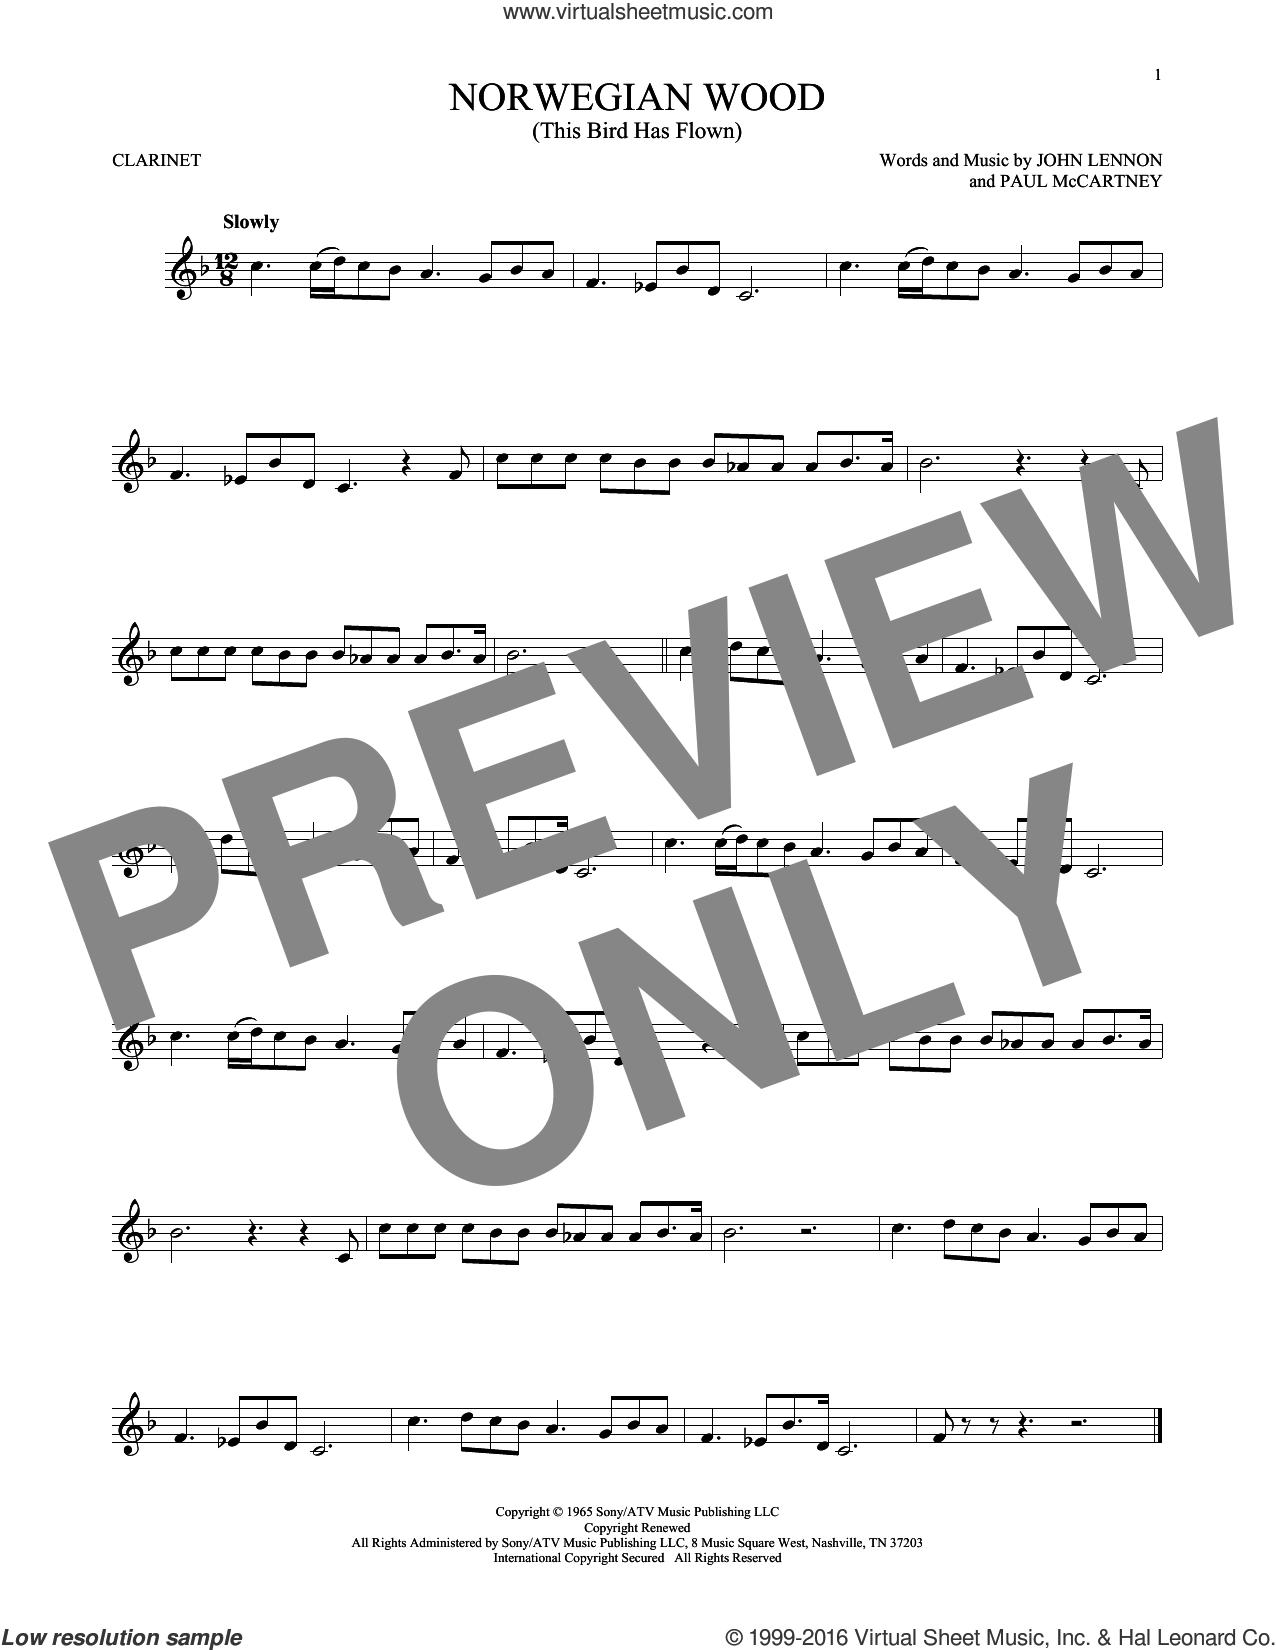 Norwegian Wood (This Bird Has Flown) sheet music for clarinet solo by The Beatles, John Lennon and Paul McCartney, intermediate skill level